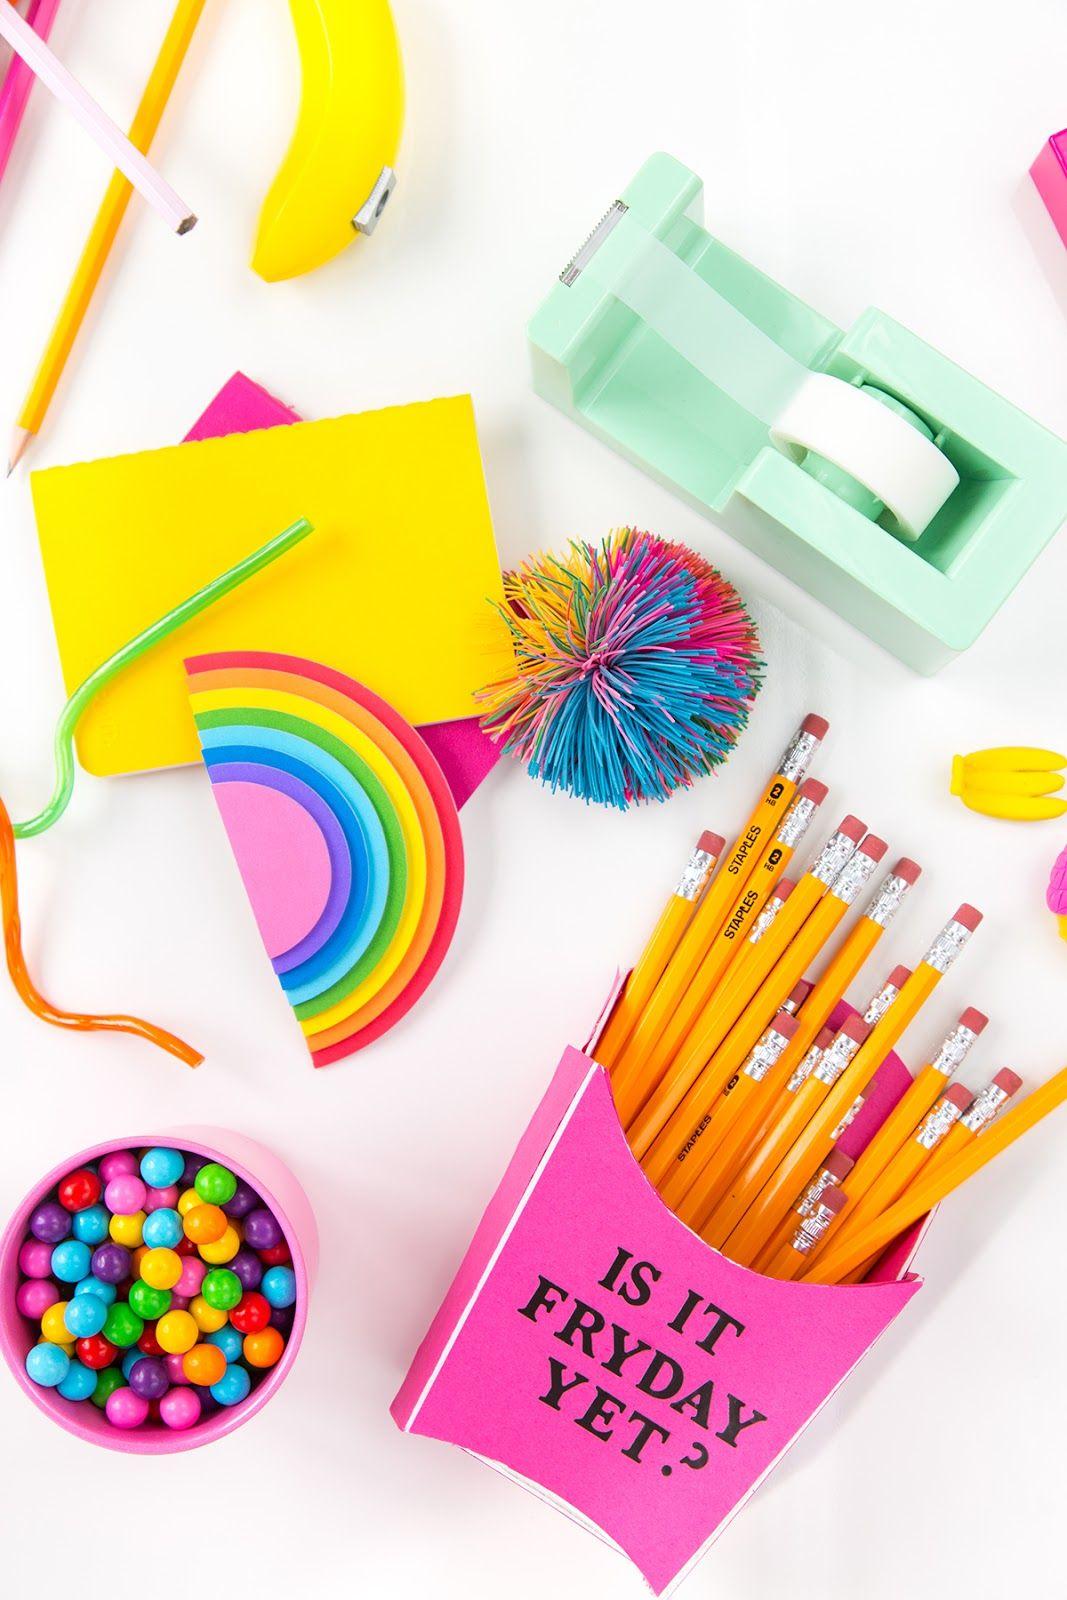 4 Easy Back To School Supply Diys